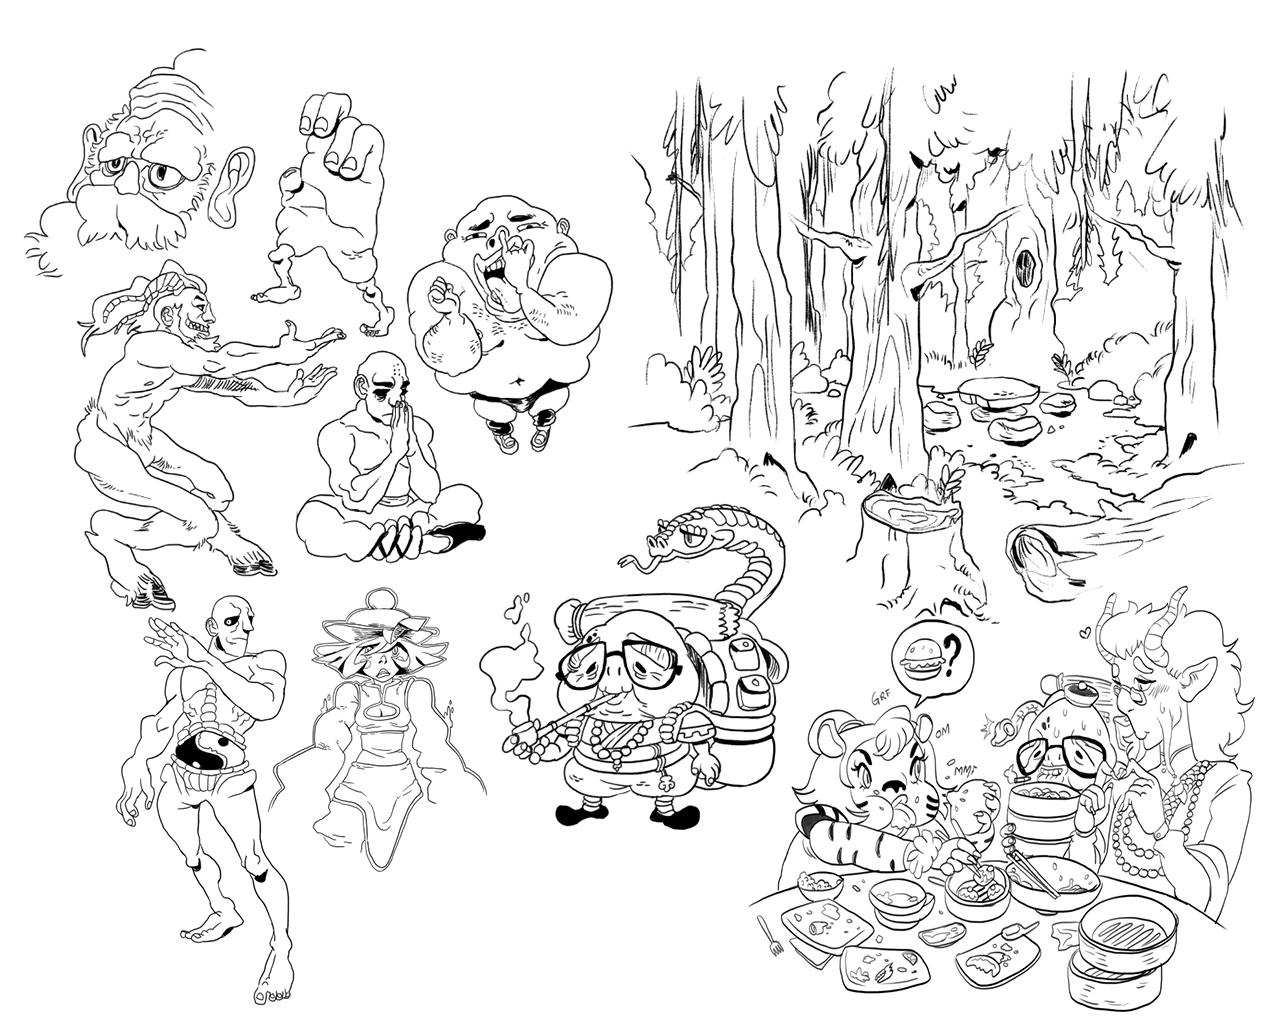 sketch33.png